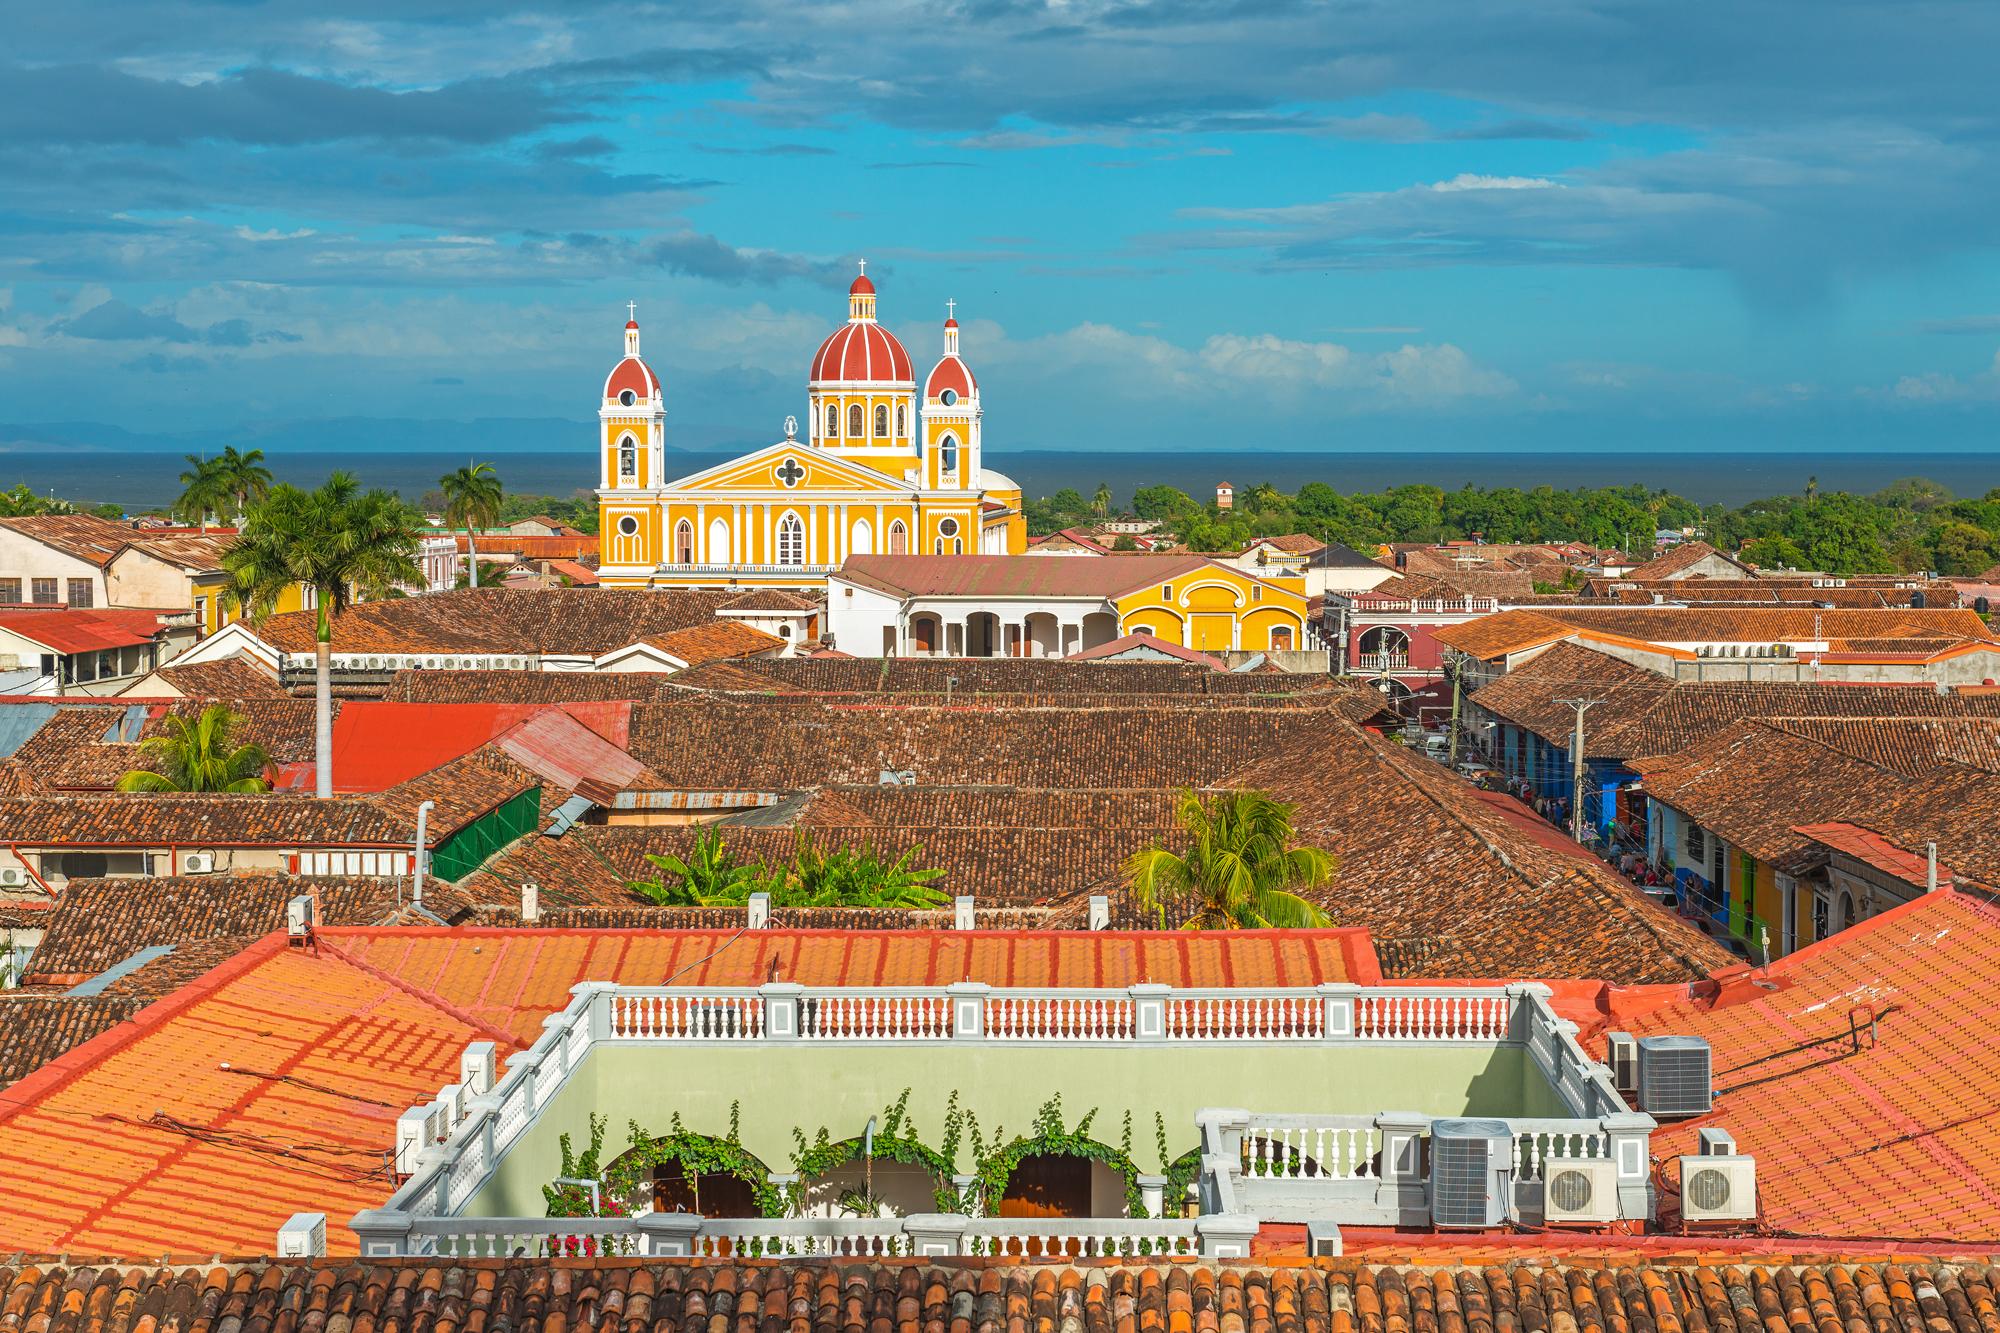 https://blancocigars.com/wp-content/uploads/2020/06/Granada-Nicaragua.jpg